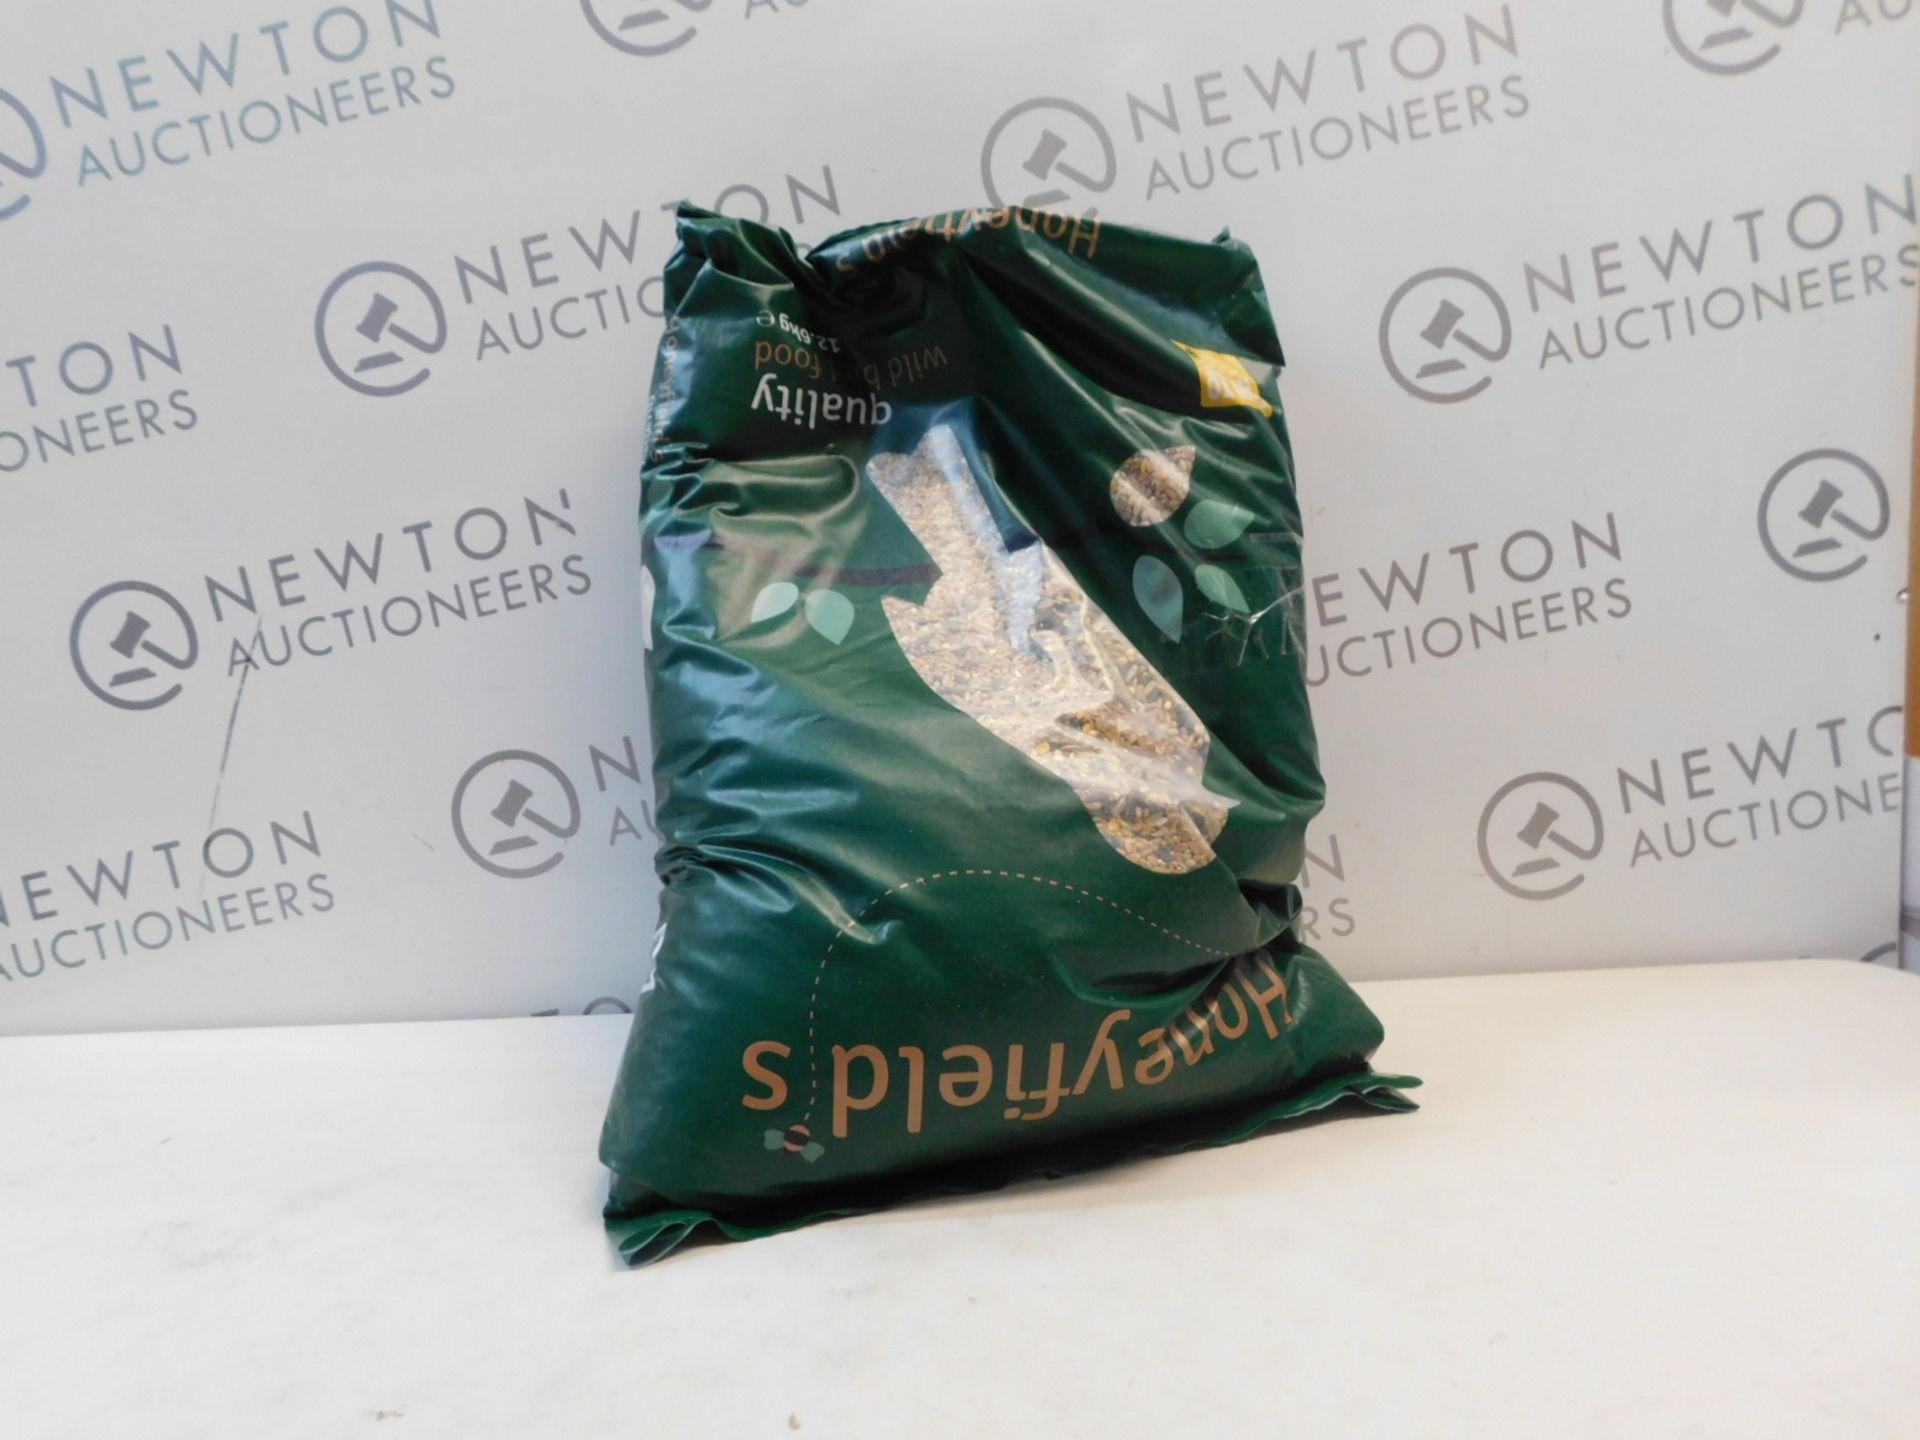 1 BAG OF HONEYFIELD'S BIRD SEEDS RRP £24.99